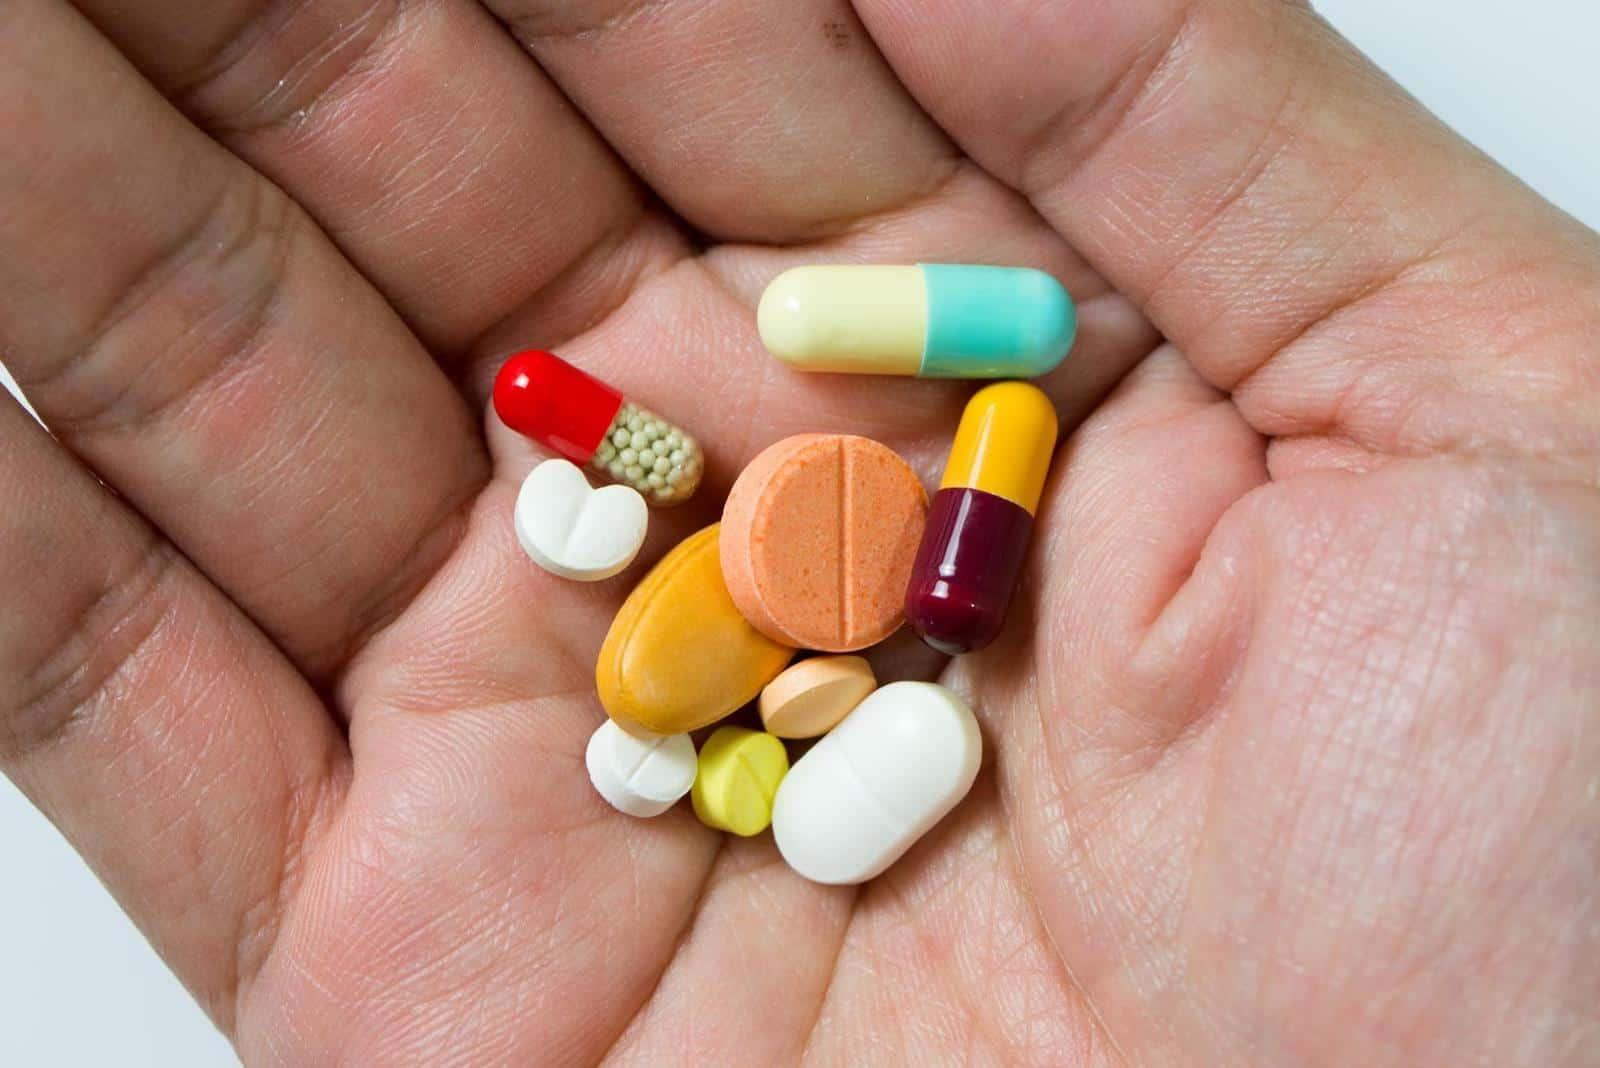 Shoulder arthritis: Hand full of different pills